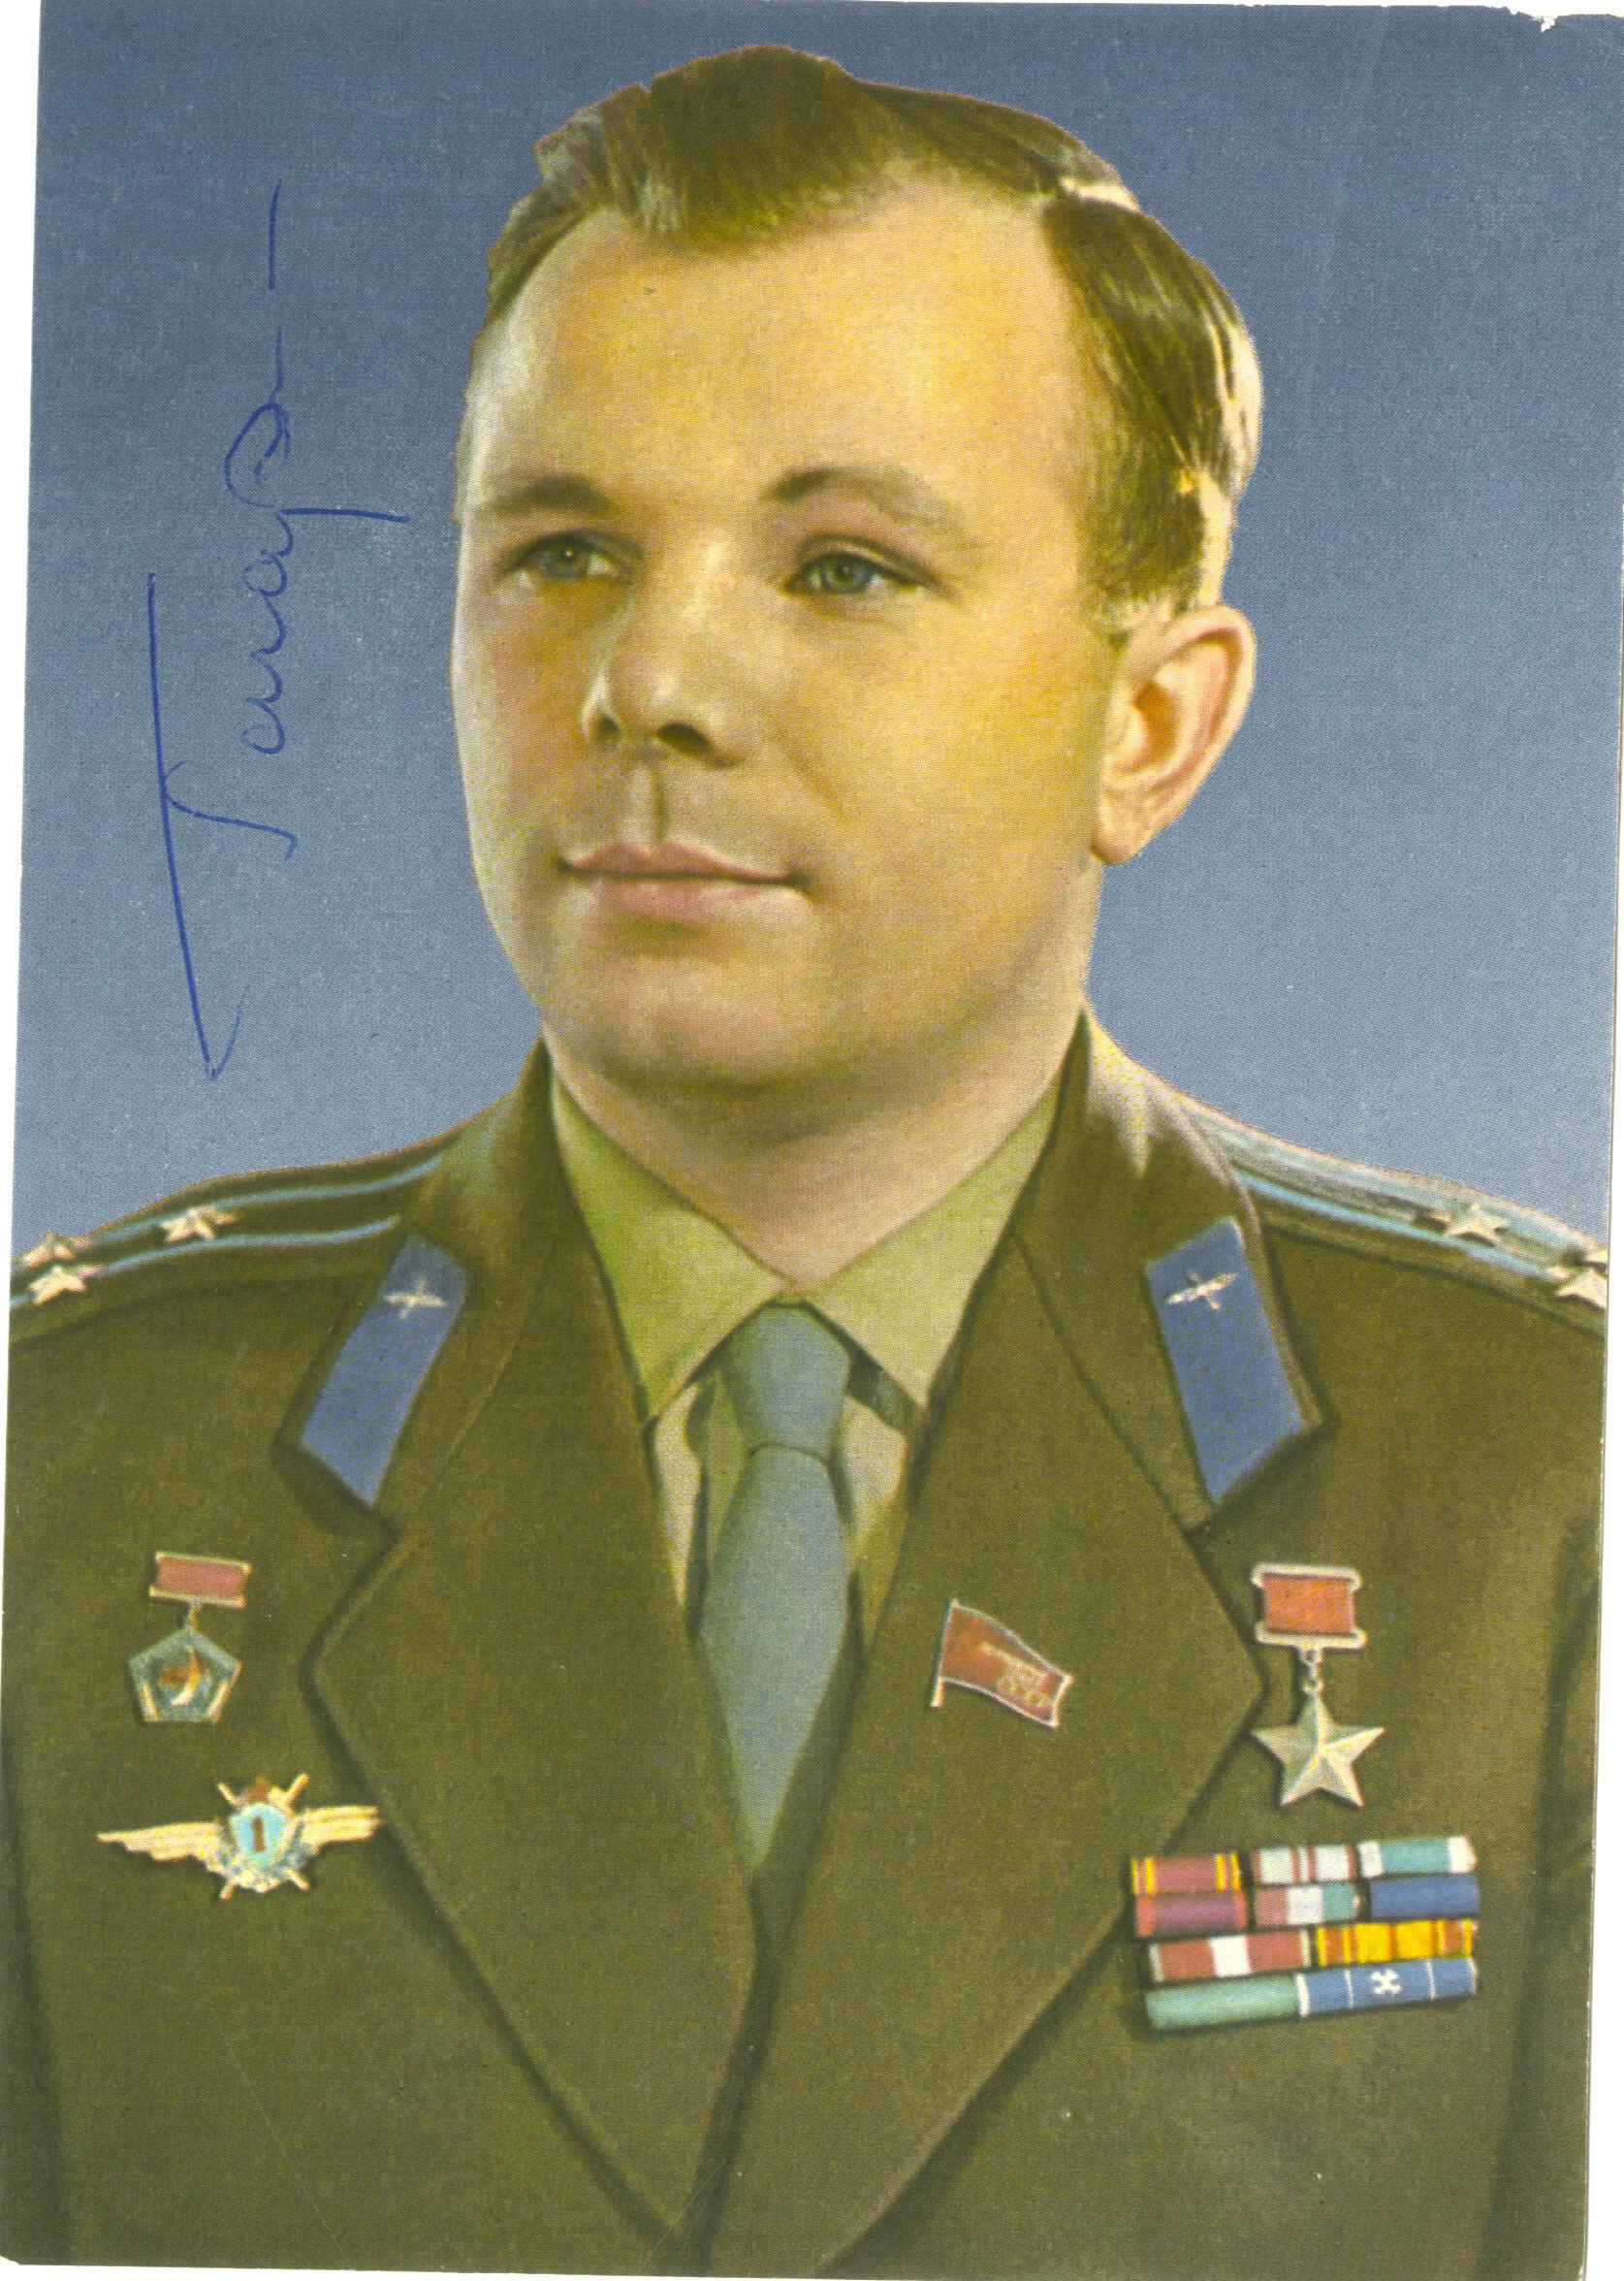 Yuri Gagarin signed portrait postcard